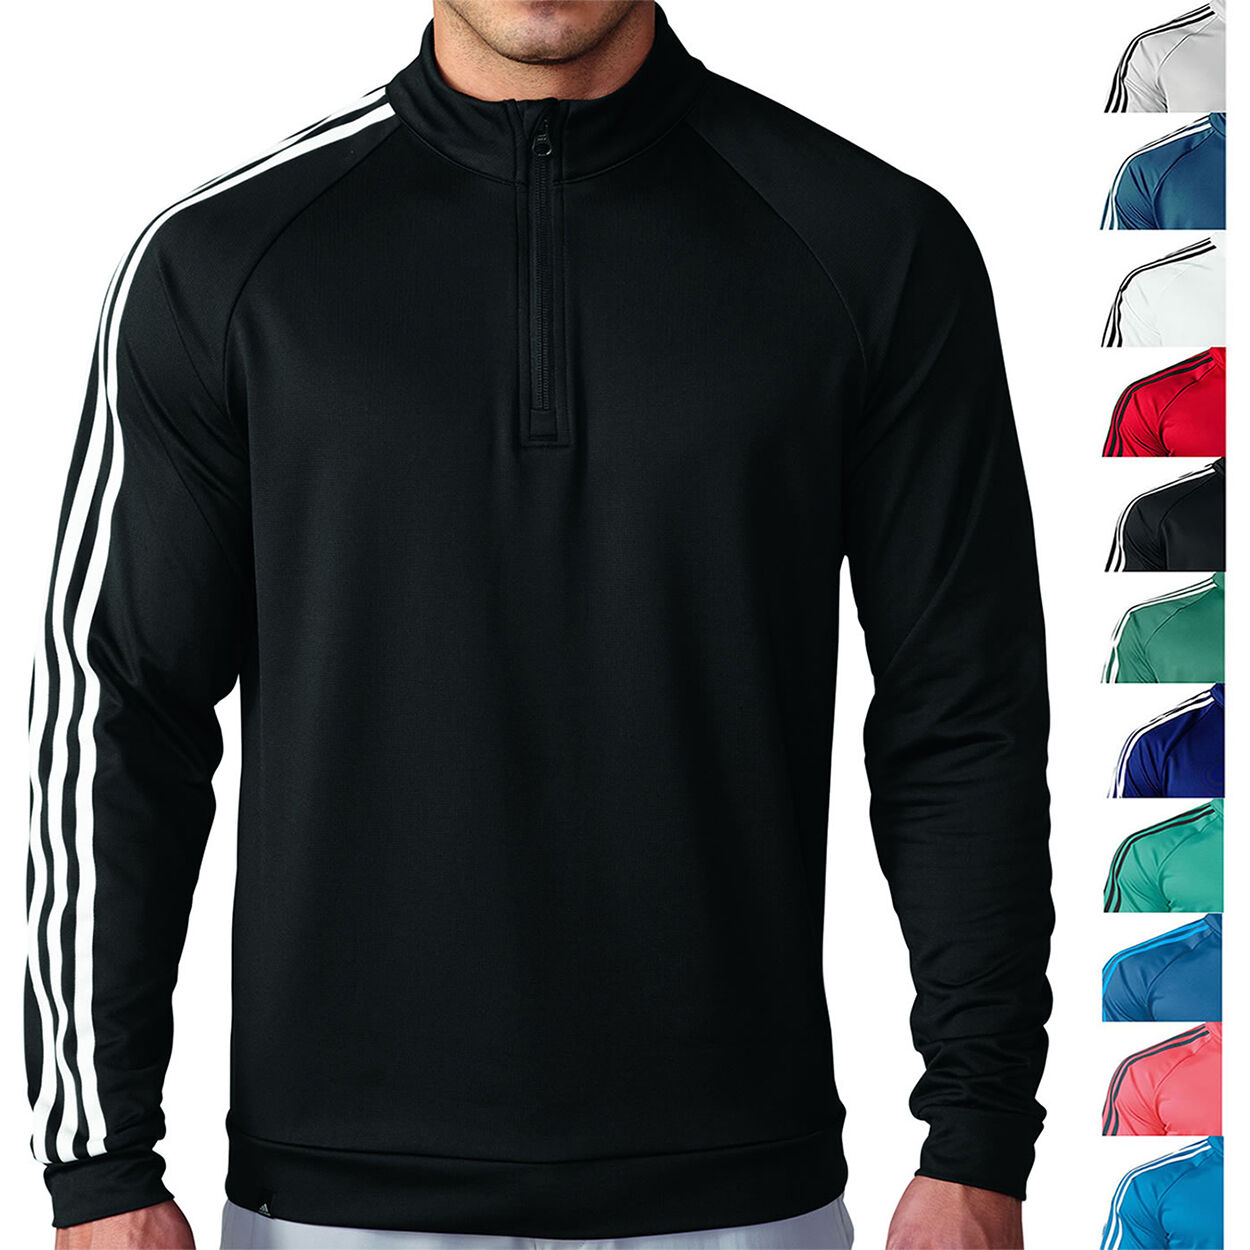 Adidas Golf 3 Stripes 1/4 Zip Pullover Mens 11 Colors